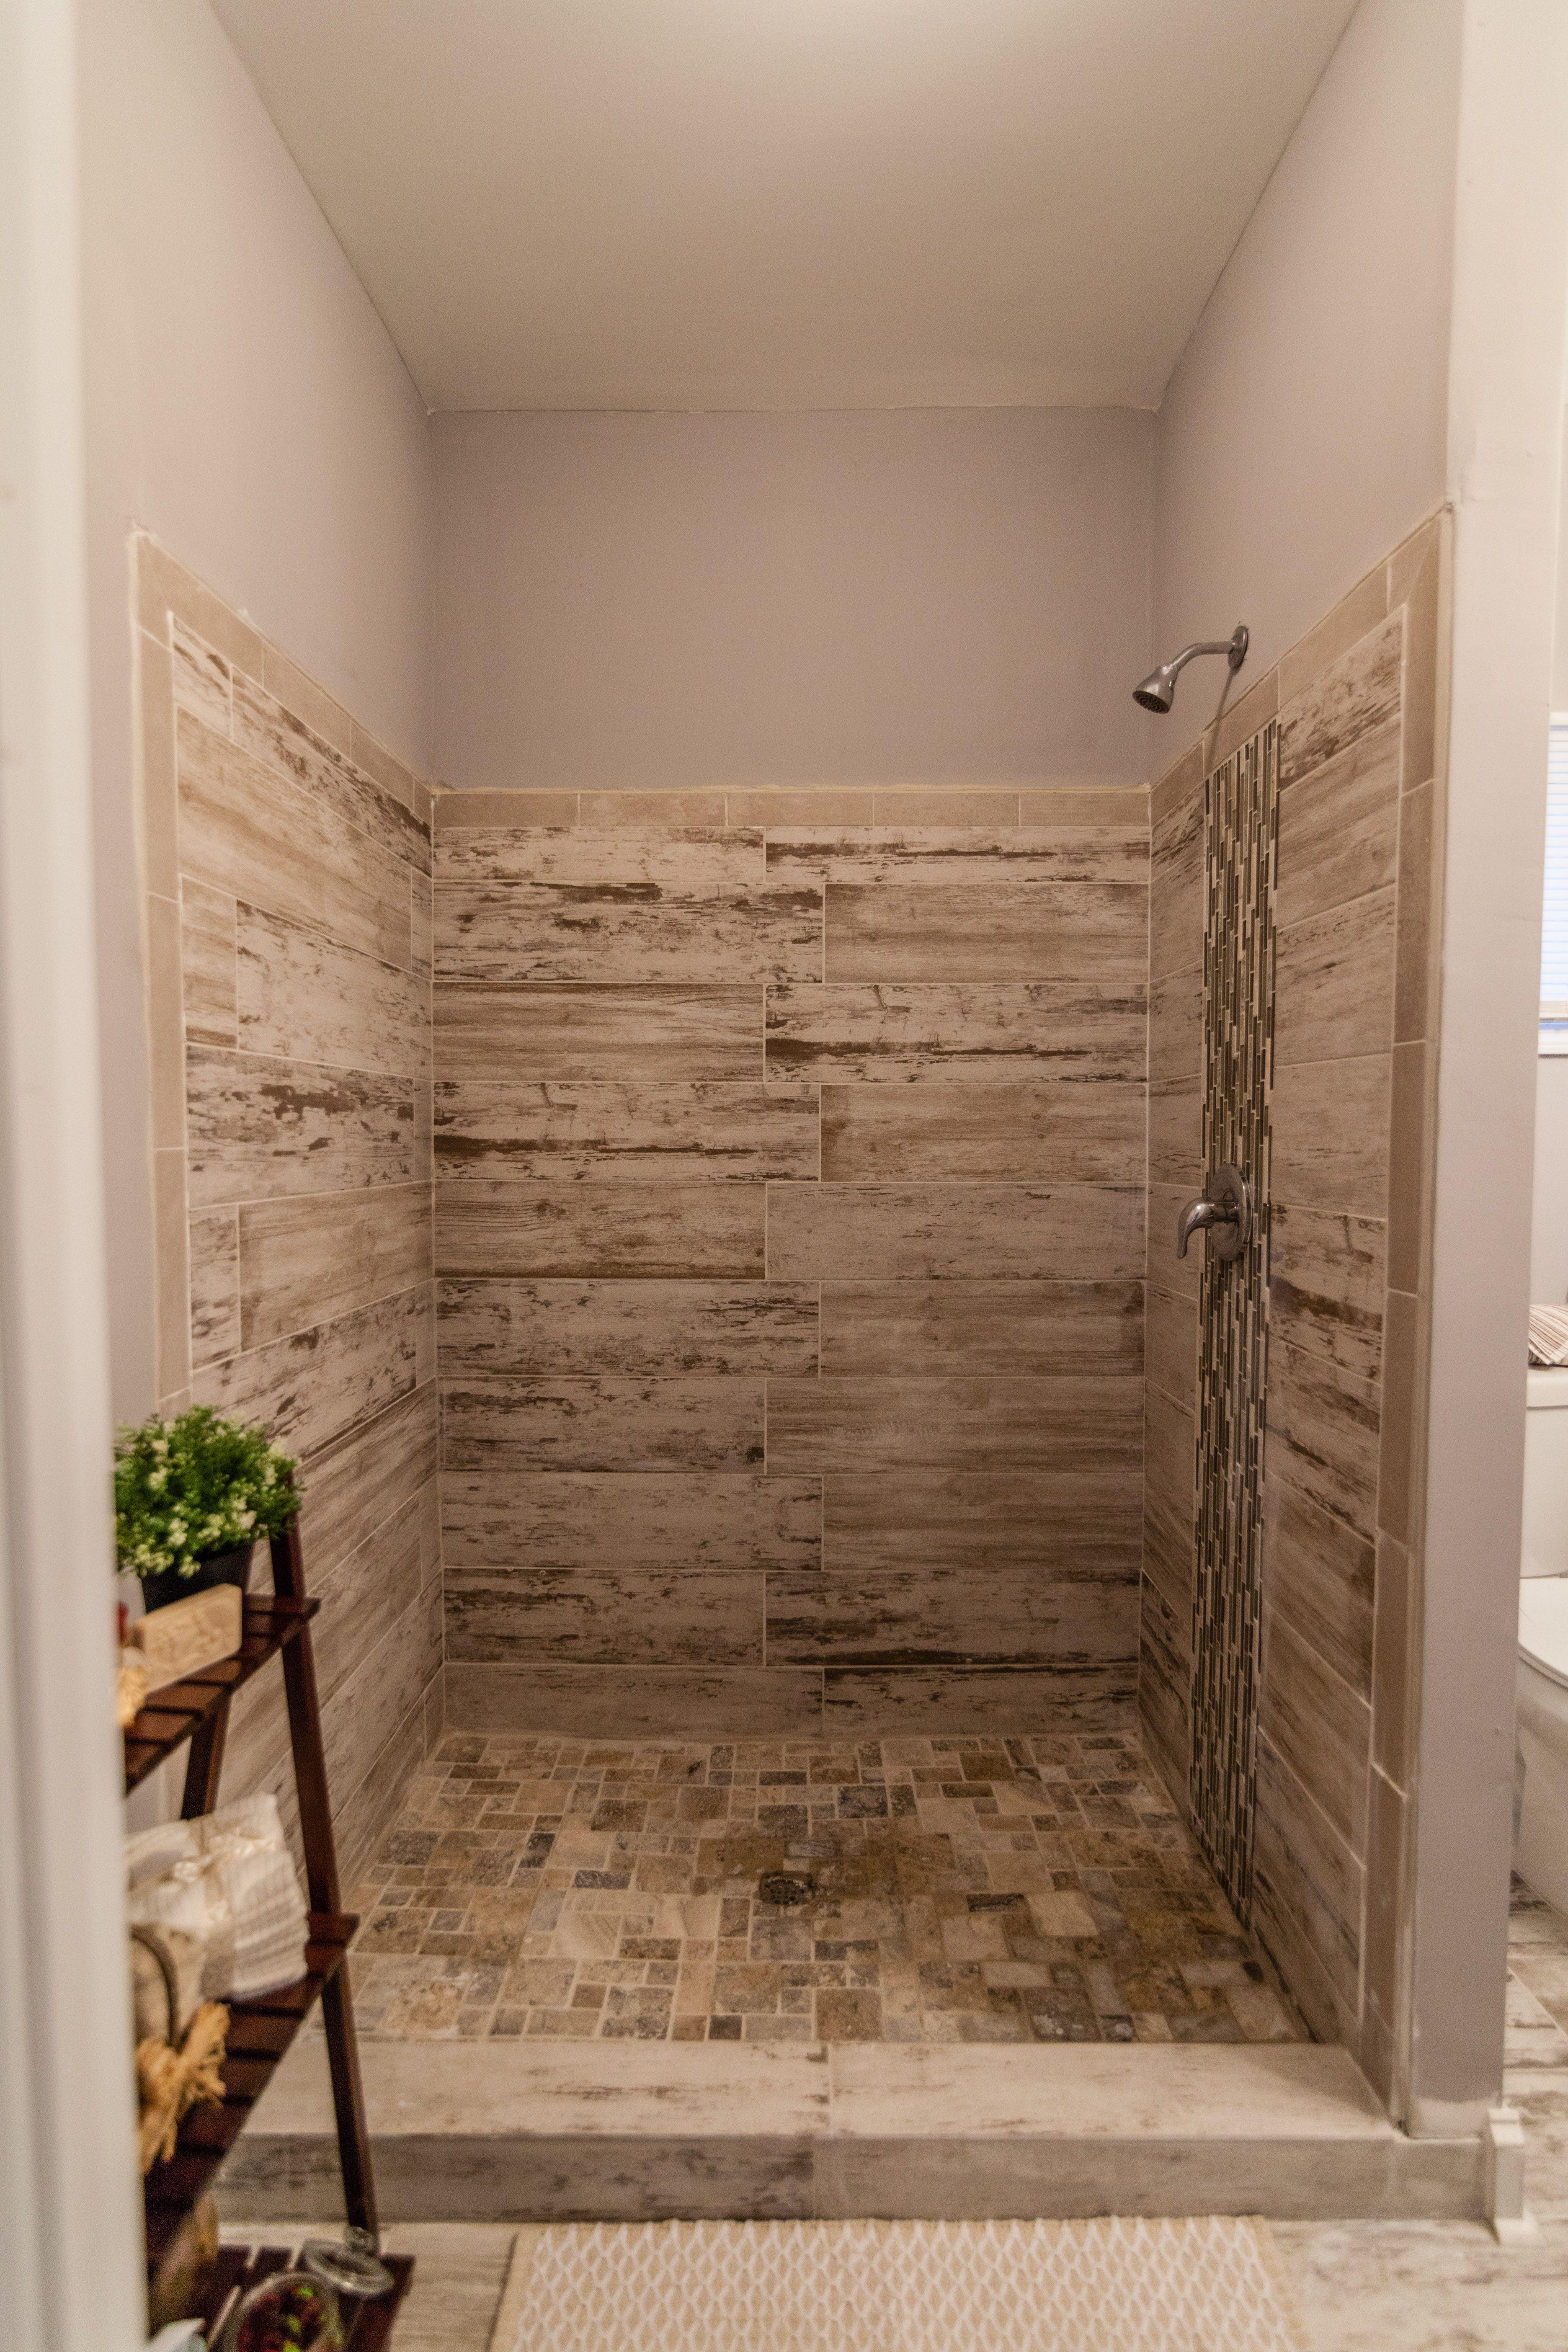 Bathroom Renovation Project Bathroom Bathroomideas Bathroomremodel Bathroomdecor Bathroomdesign With Images Bathrooms Remodel Bathroom Renovation Bathroom Makeover